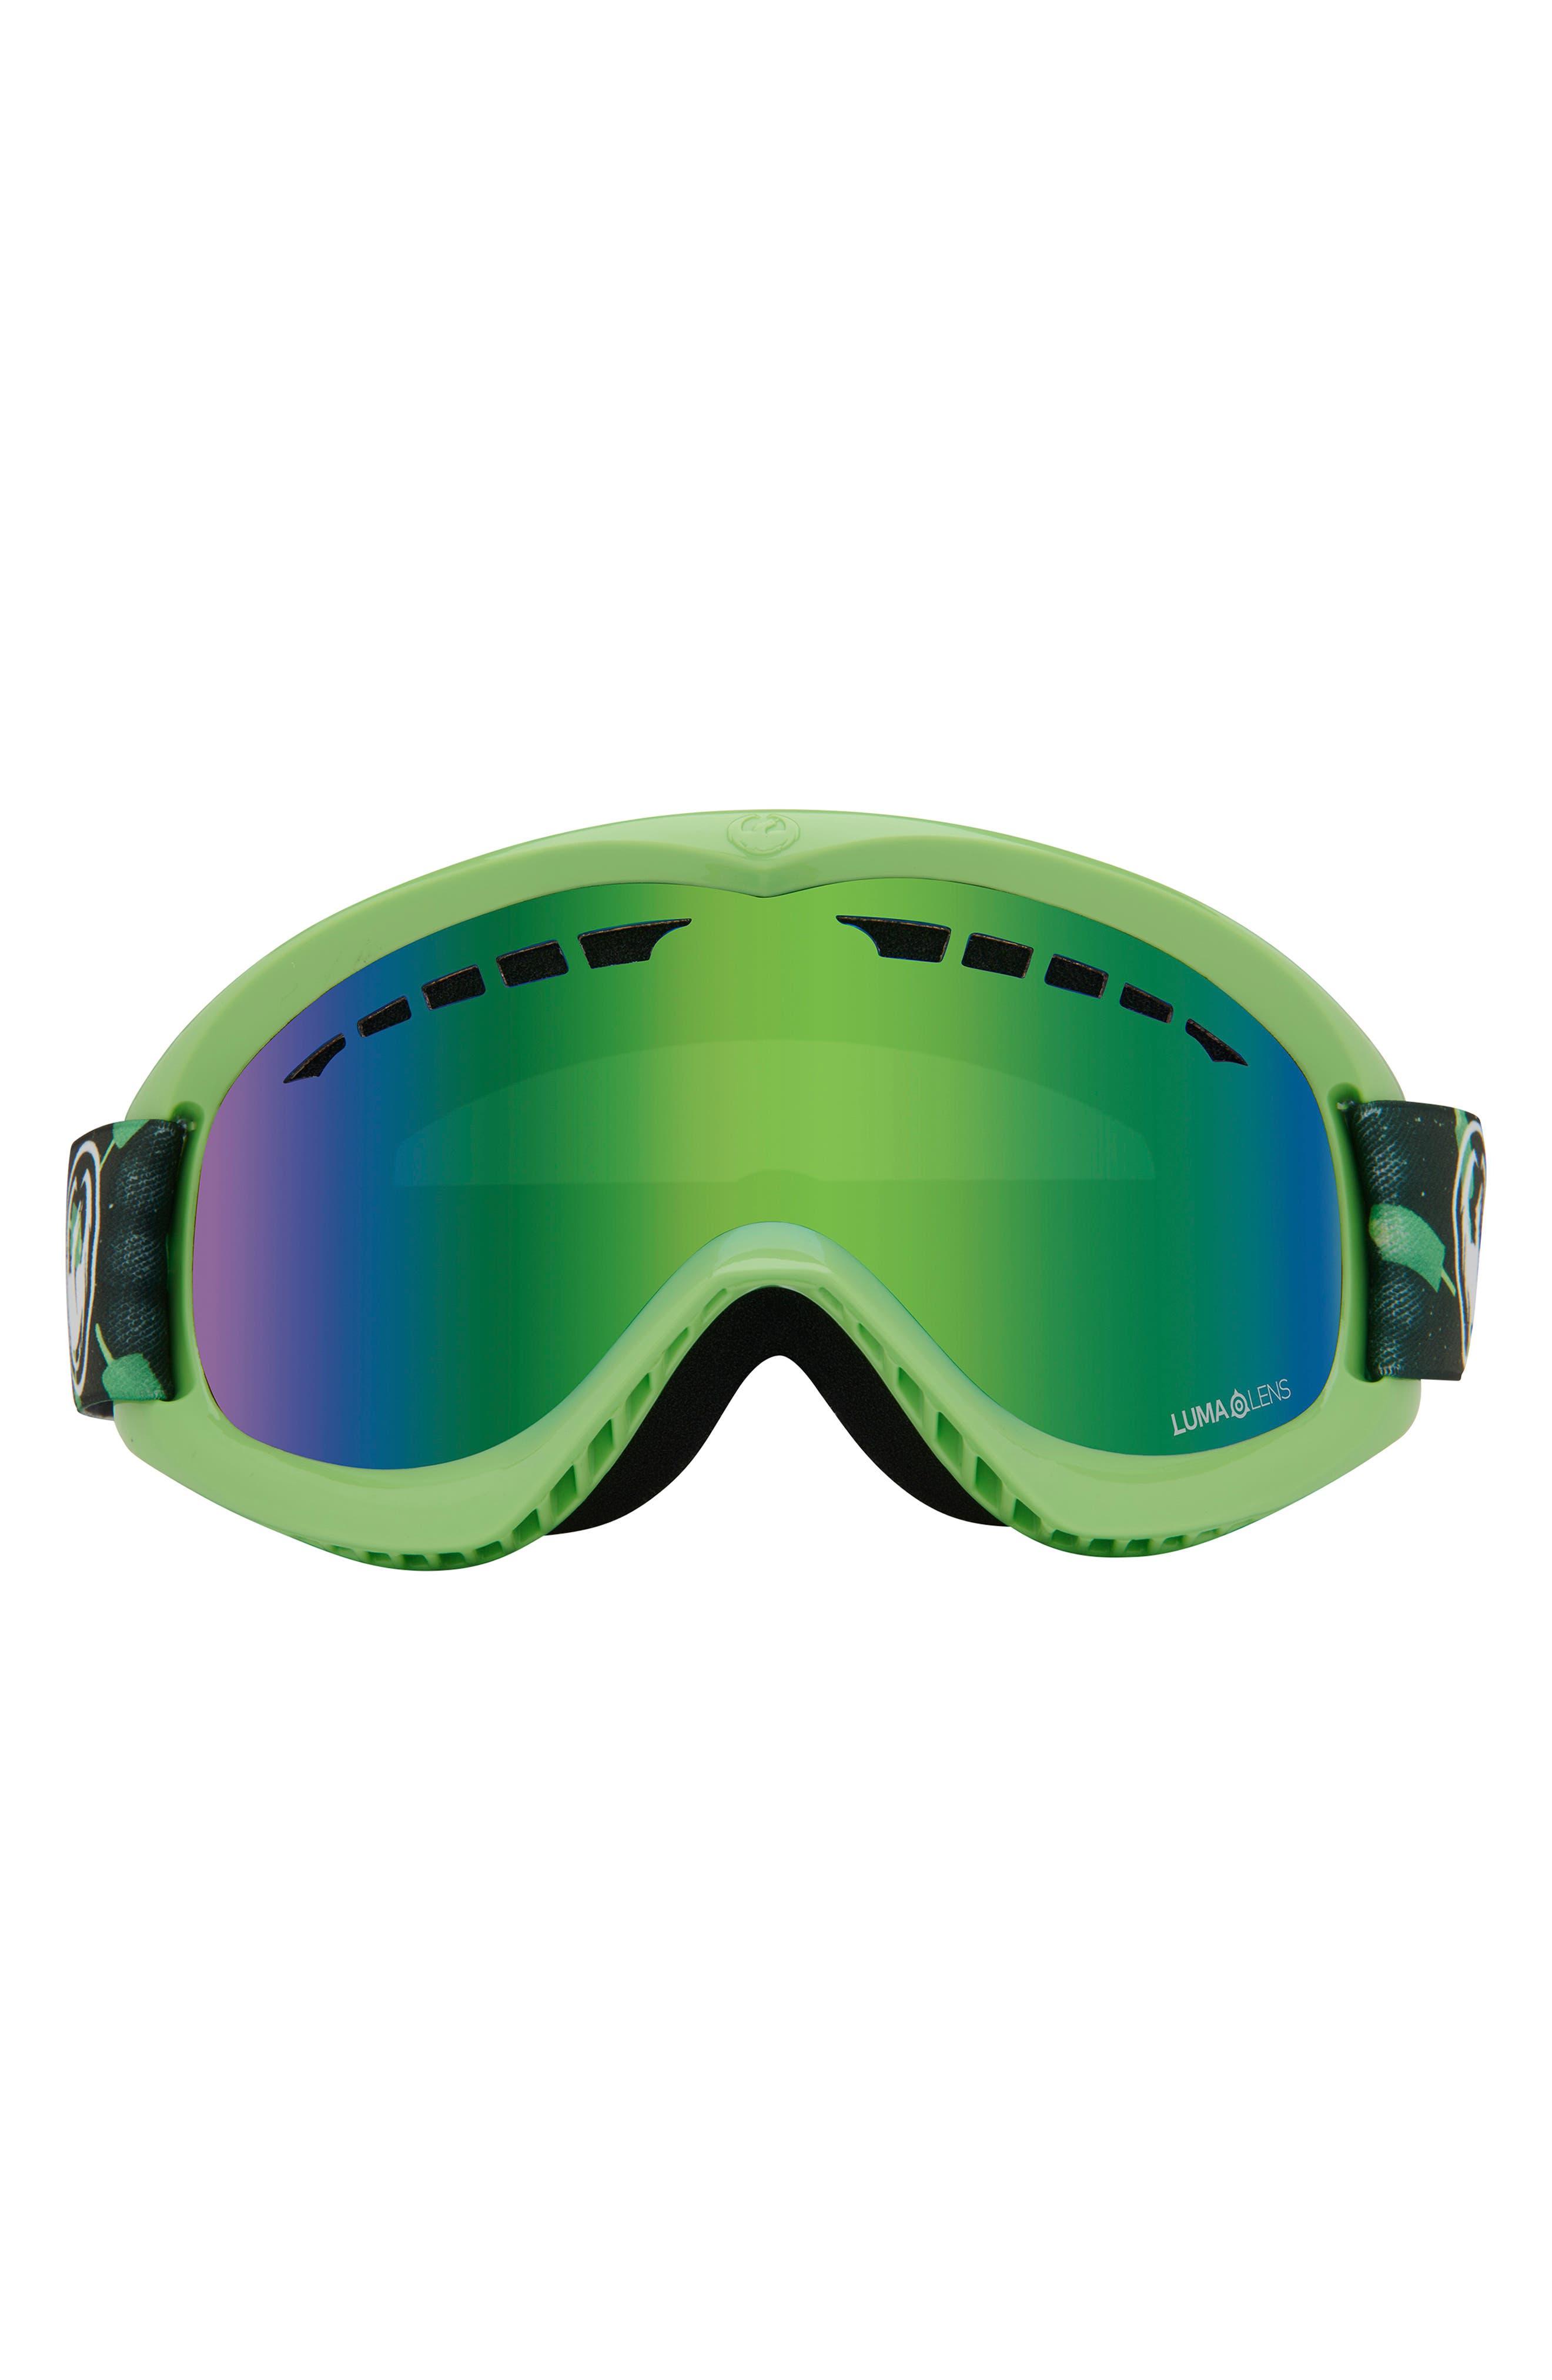 Venus//LLPINKION Dragon DR Lil D Base ION Snow Goggles